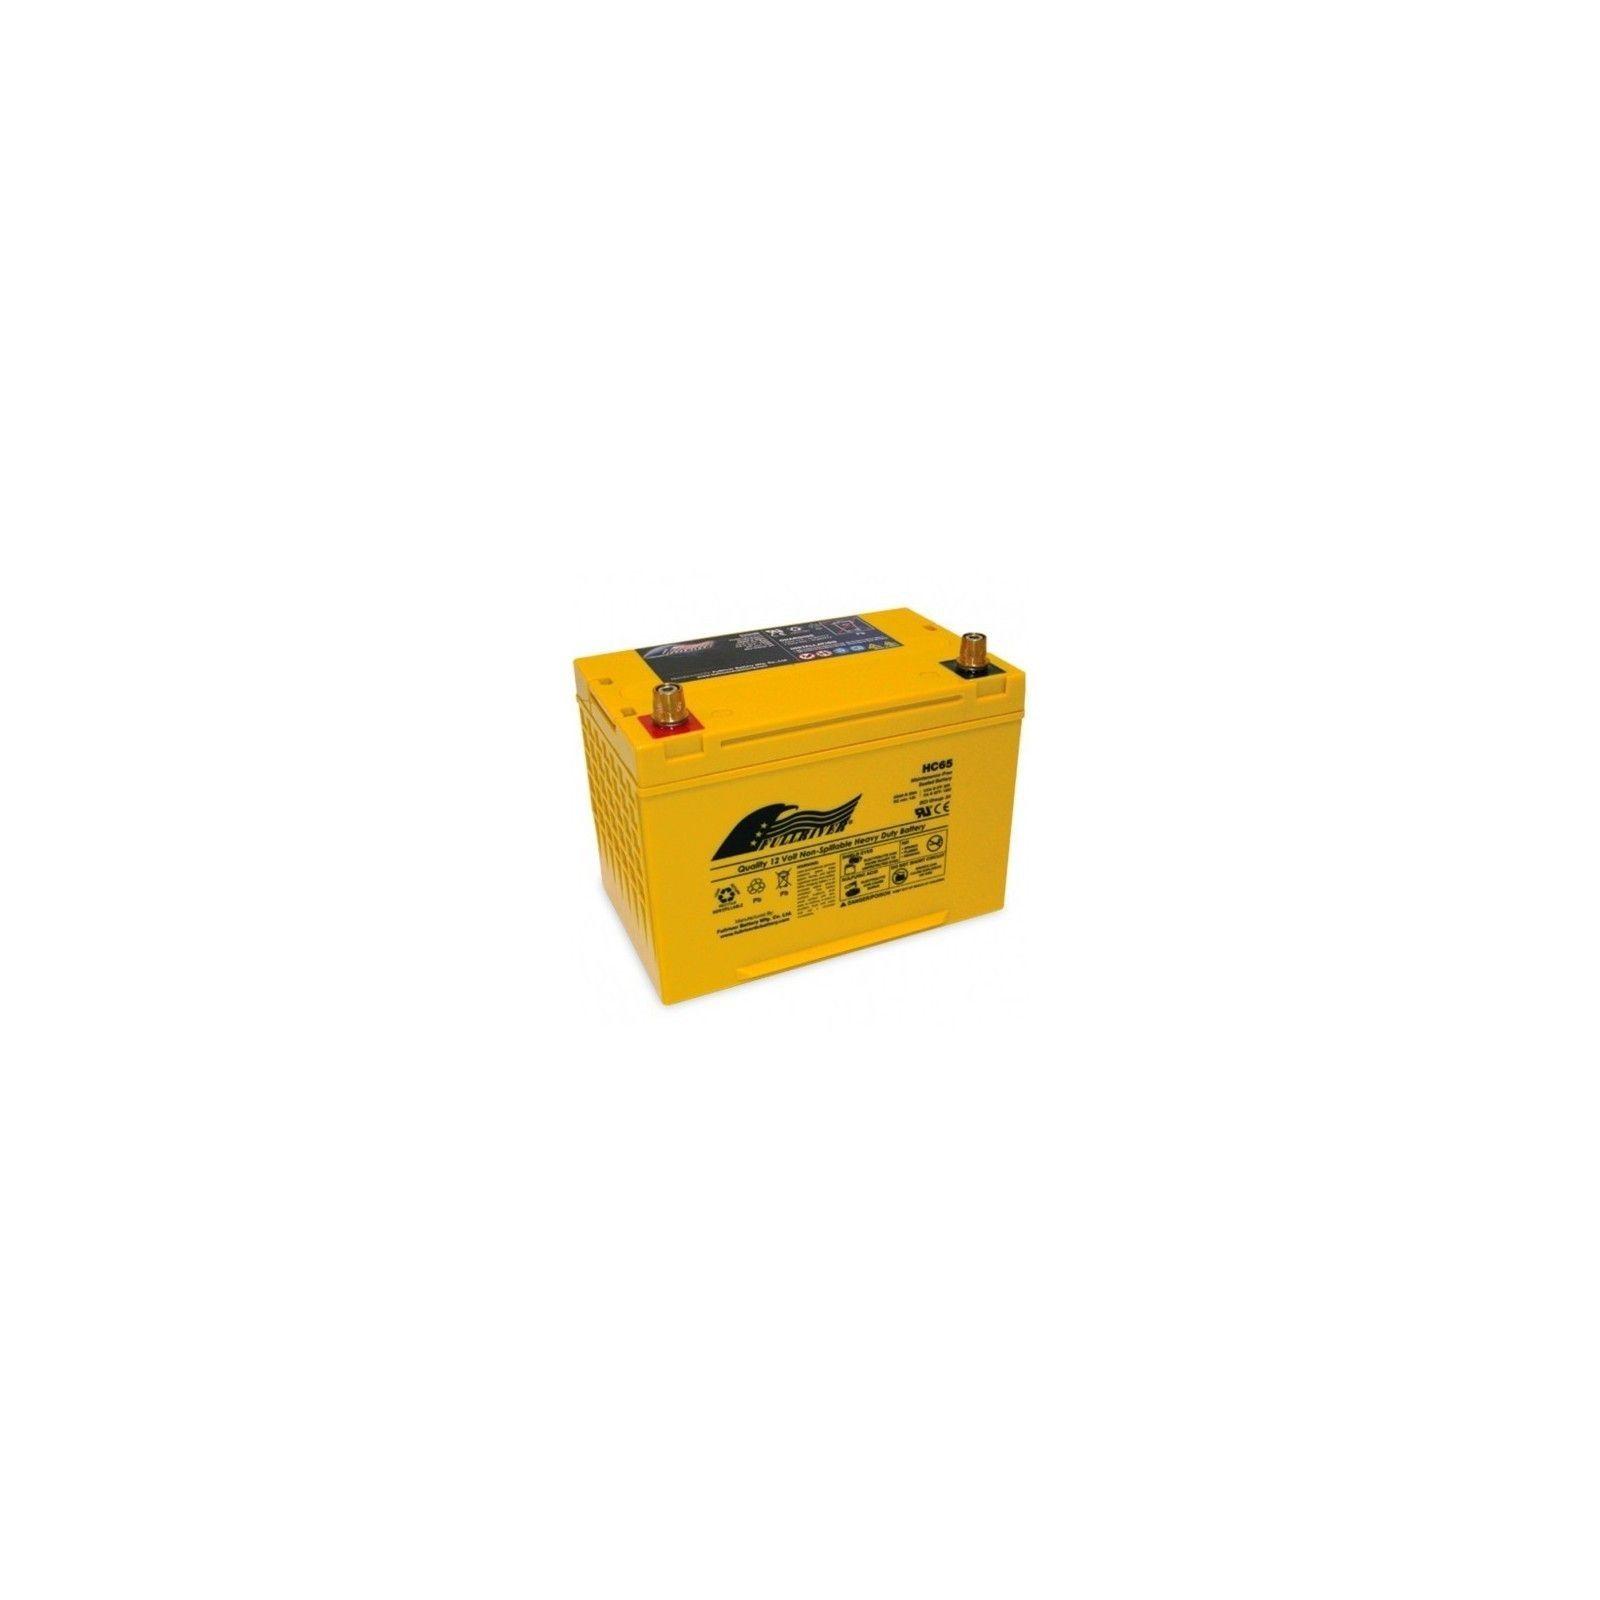 BATERIA Fullriver FULLRIVER HC65 65Ah 825A 12V FULLRIVER - 1